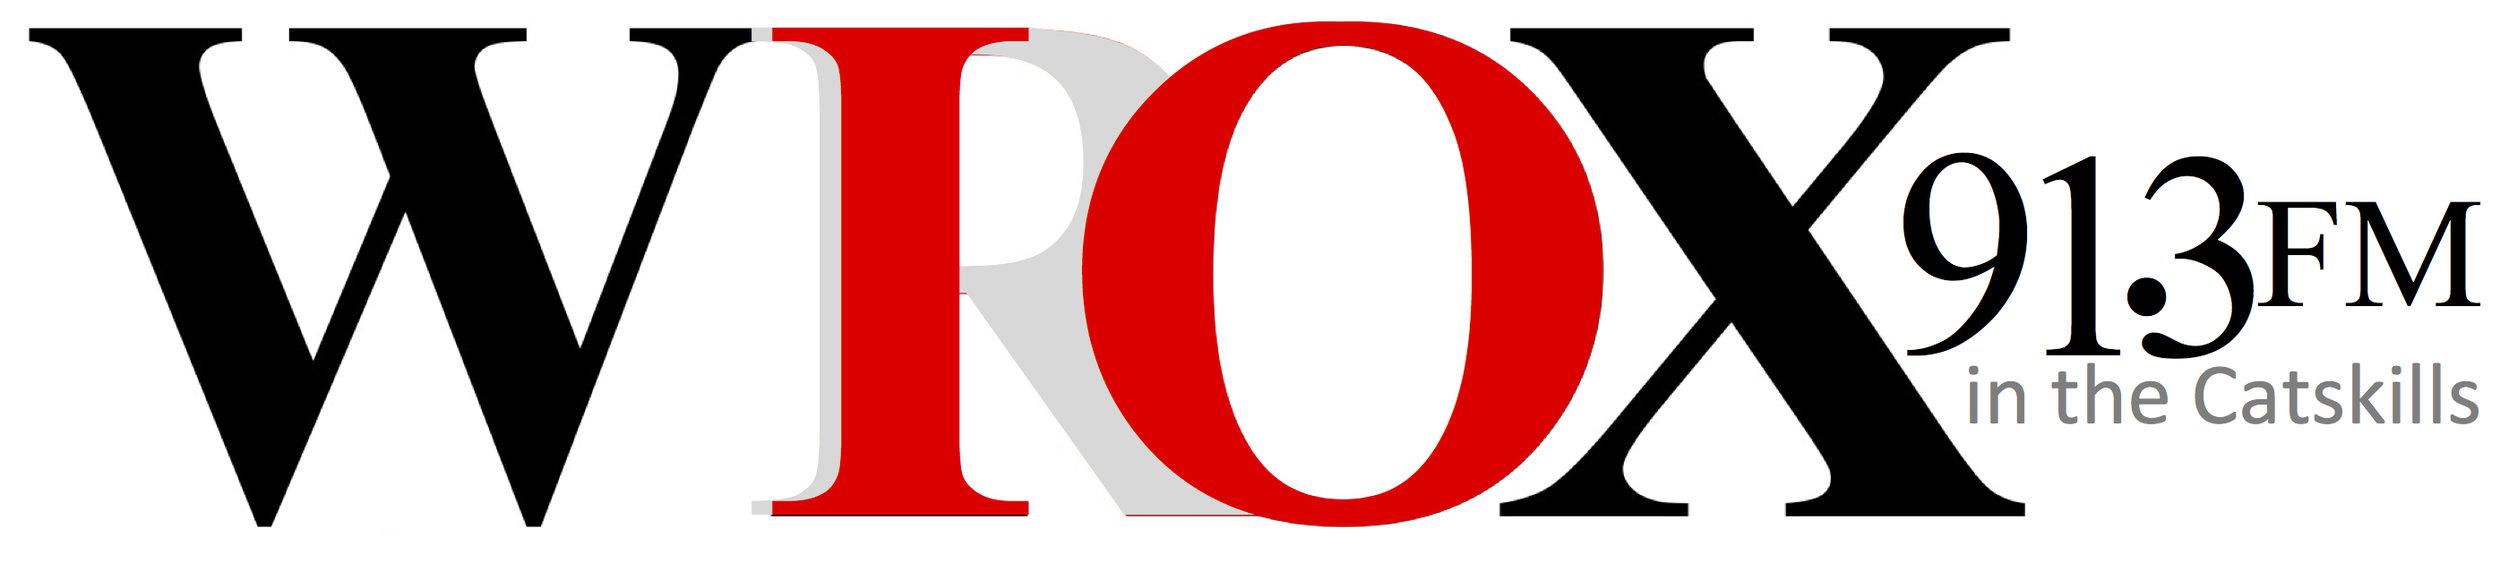 WIOX plain logo.jpg